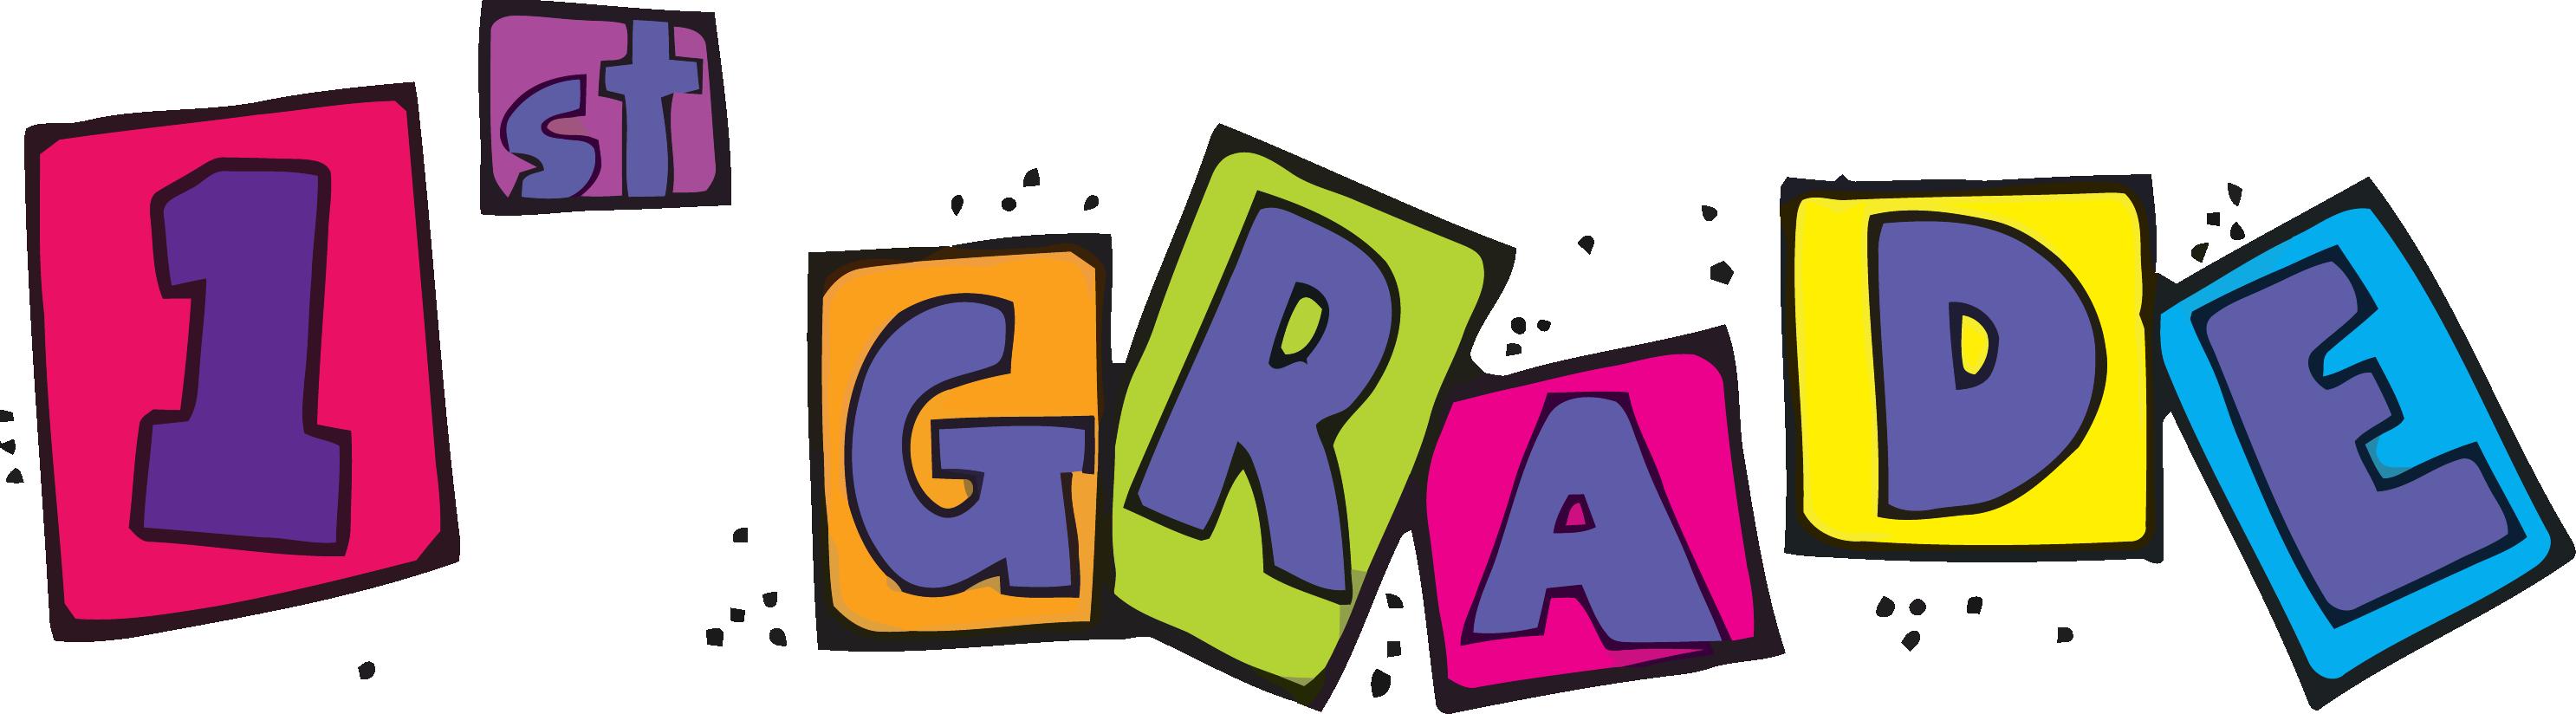 23++ First grade clipart free ideas